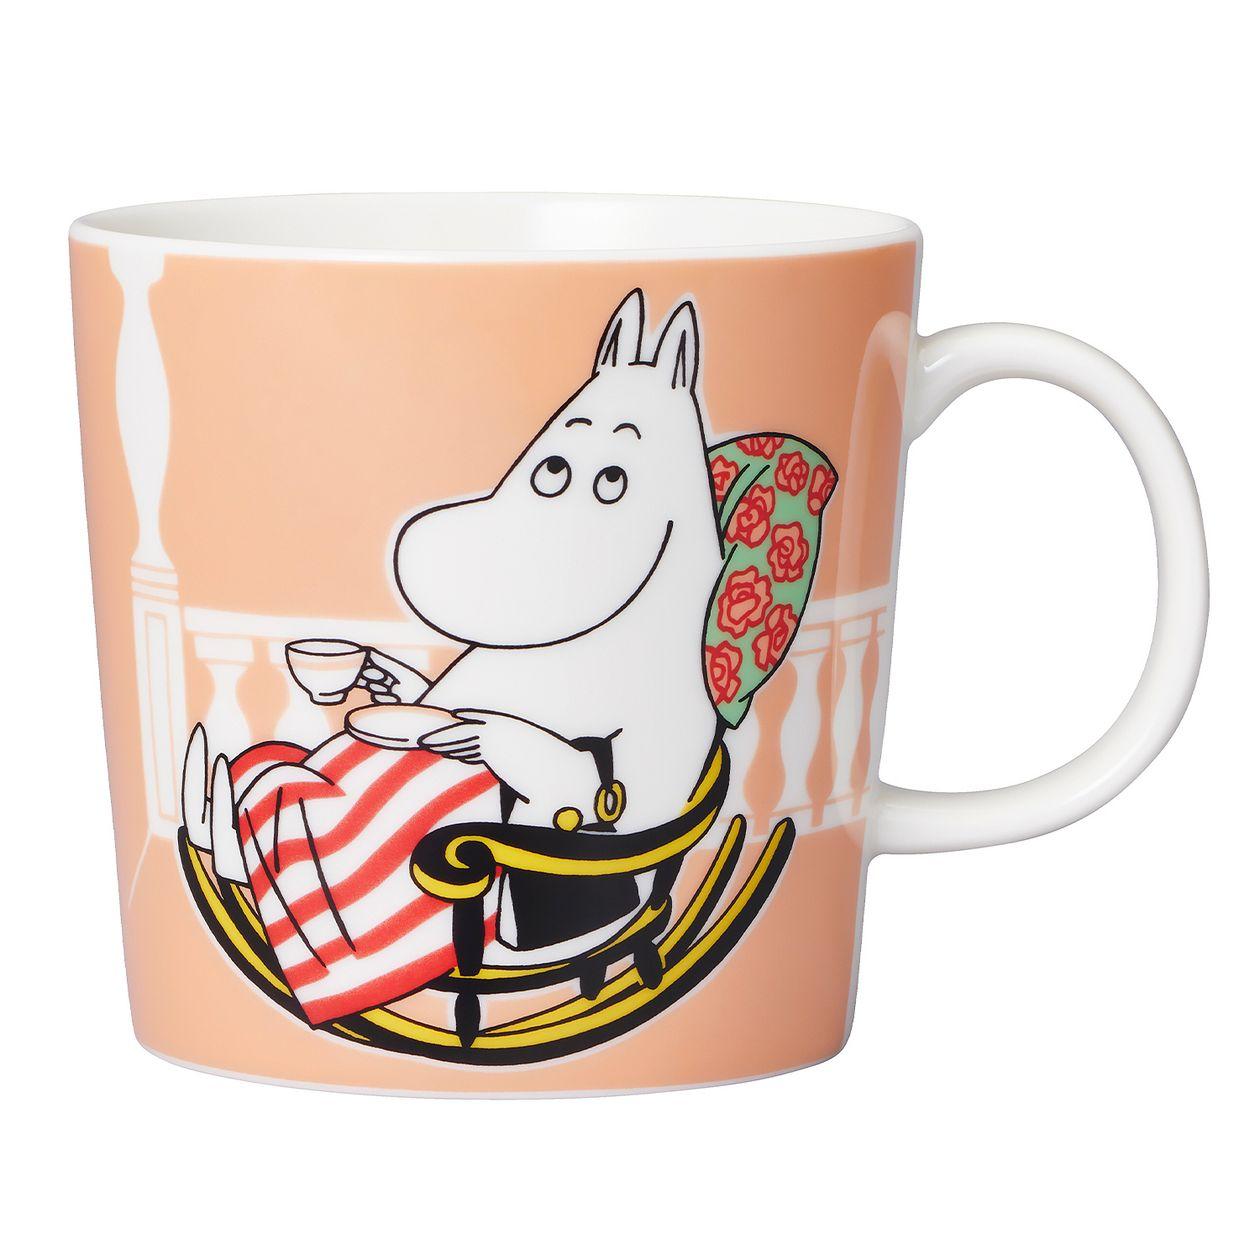 Moominmamma mug by Arabia